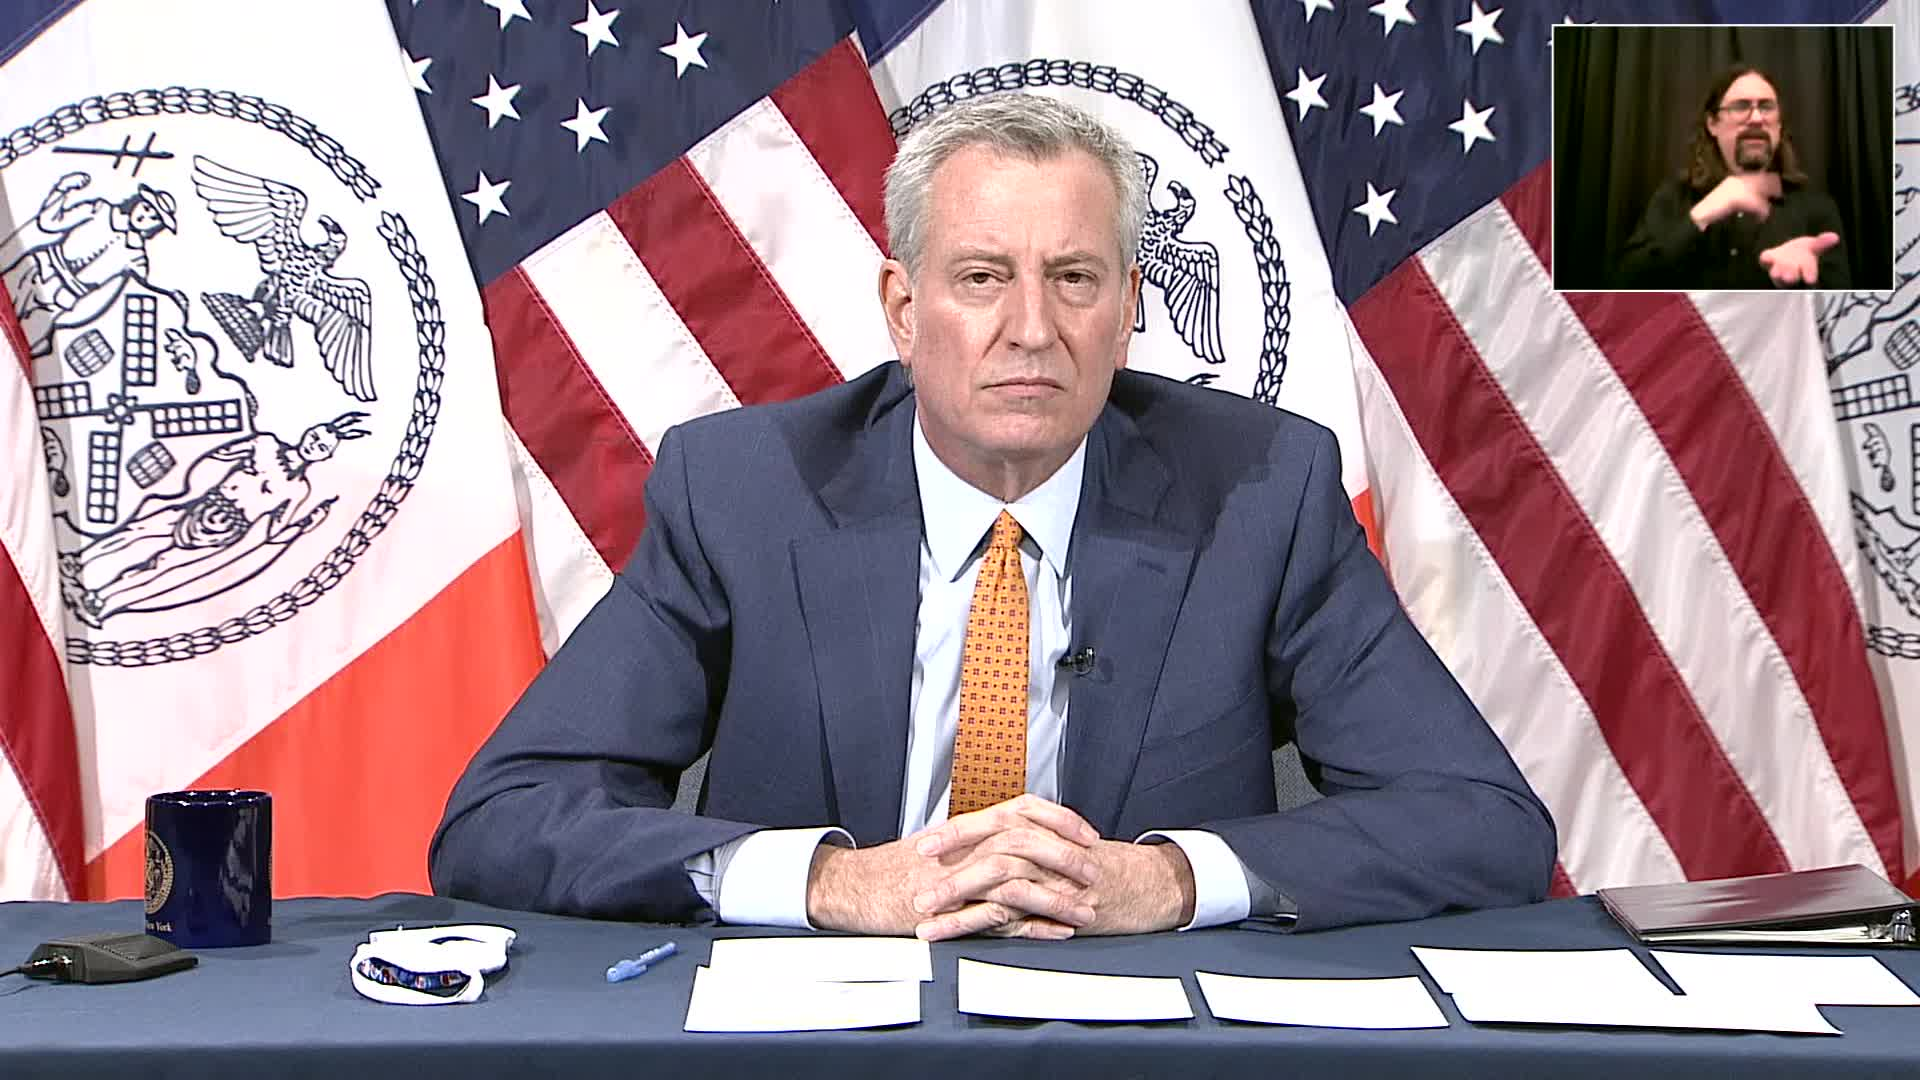 New York City Mayor Bill de Blasio speaks during a press briefing in New York on December 21.